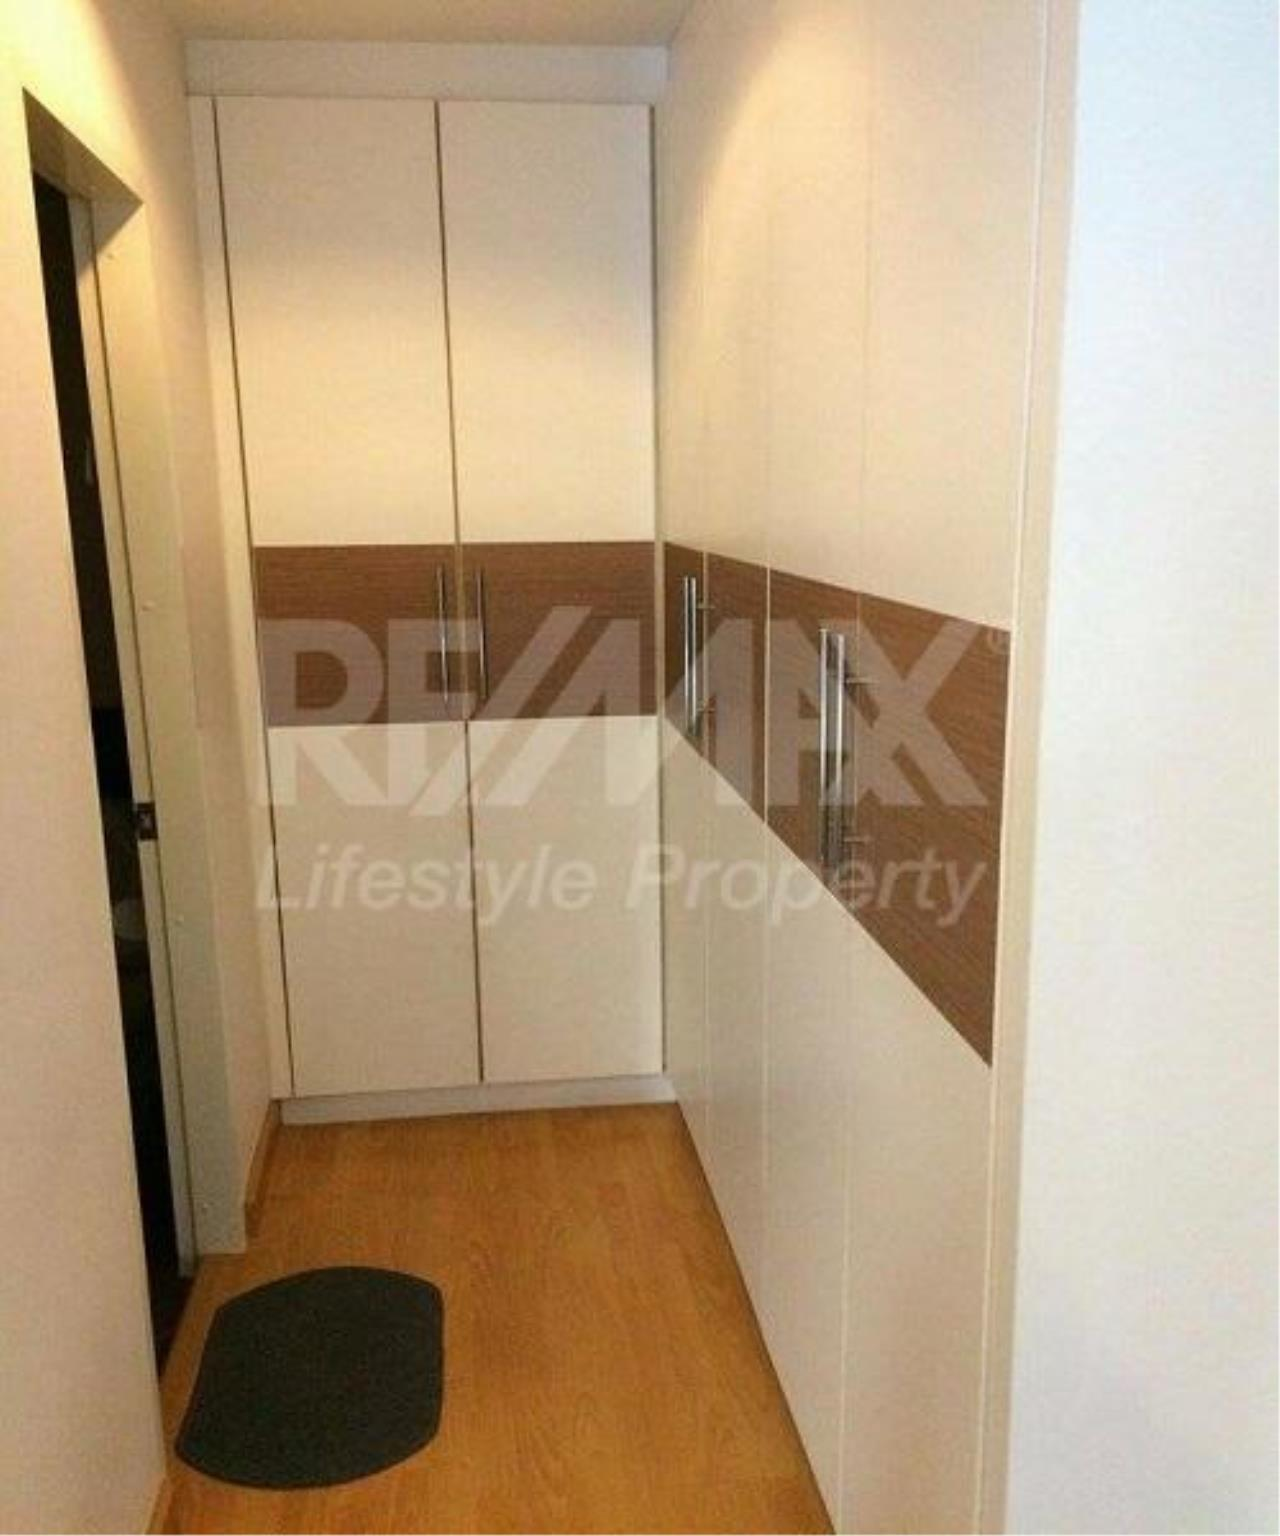 RE/MAX LifeStyle Property Agency's Serene Place Sukhumvit 24 6